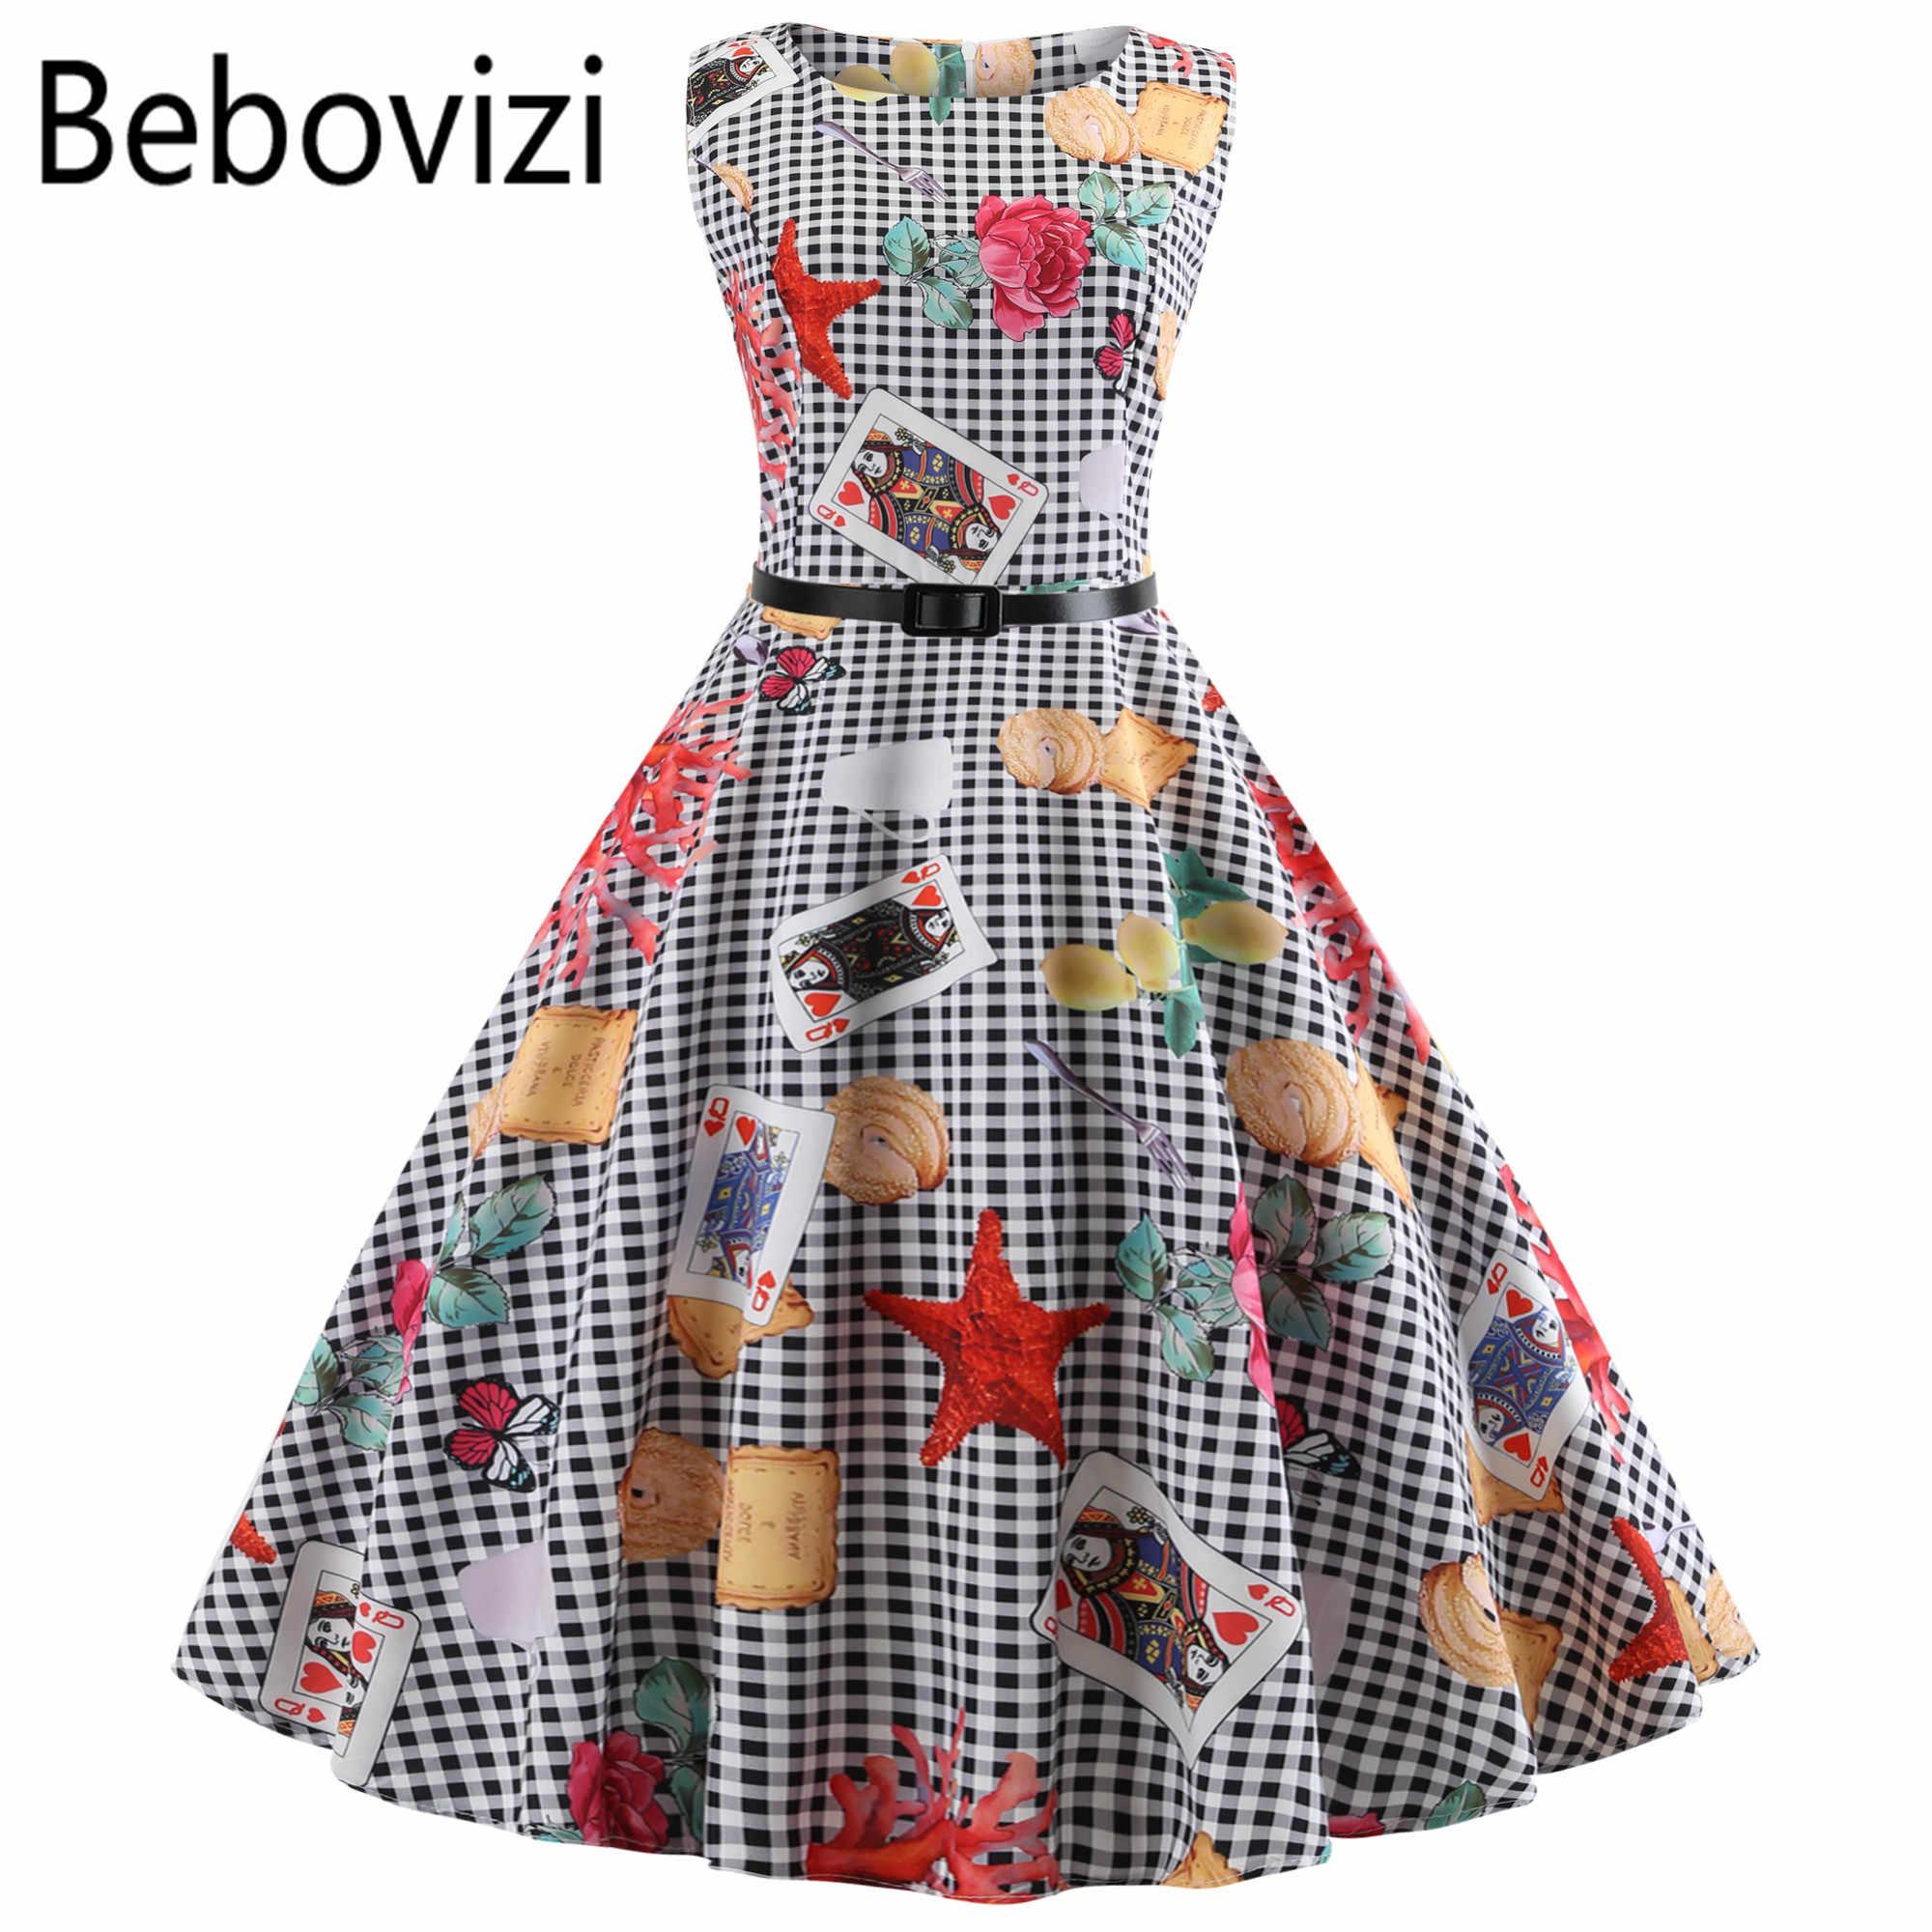 618df3c858 New Black White Plaid Plus Size Women Vintage Dress Vestidos Hepburn 50s  Party Dresses Casual Elegant Rockabilly Pin Up Sundress